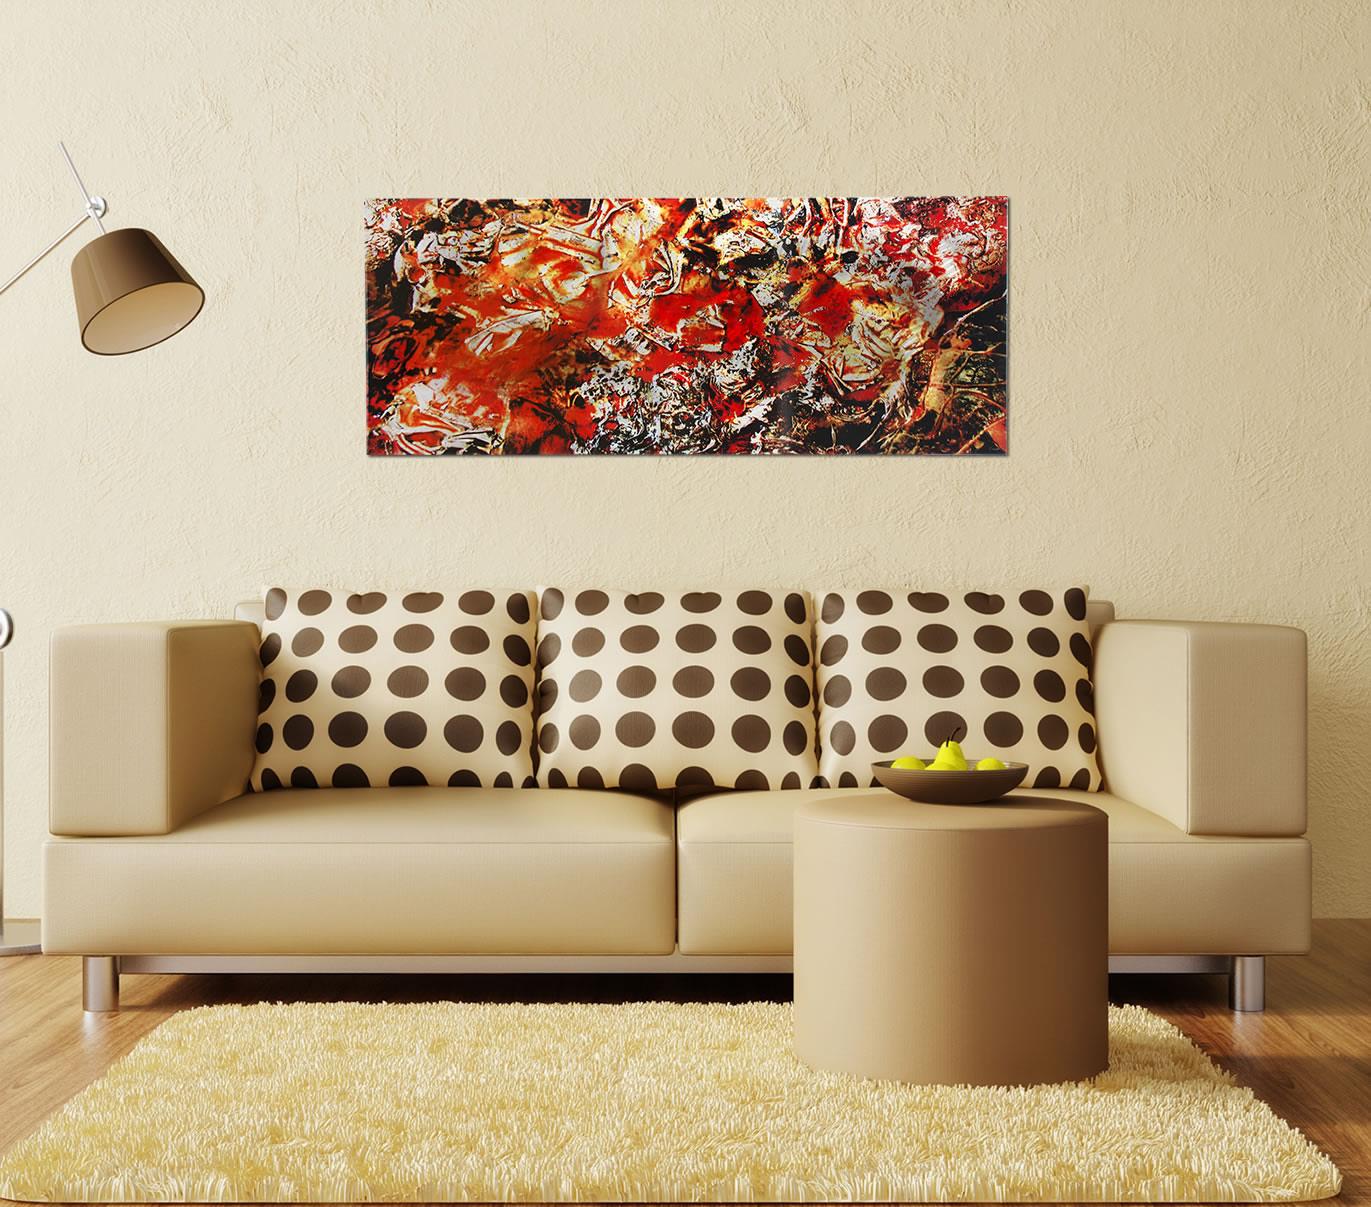 Cinders - Red/Orange Paint-Splatter Abstract Art - Lifestyle Image